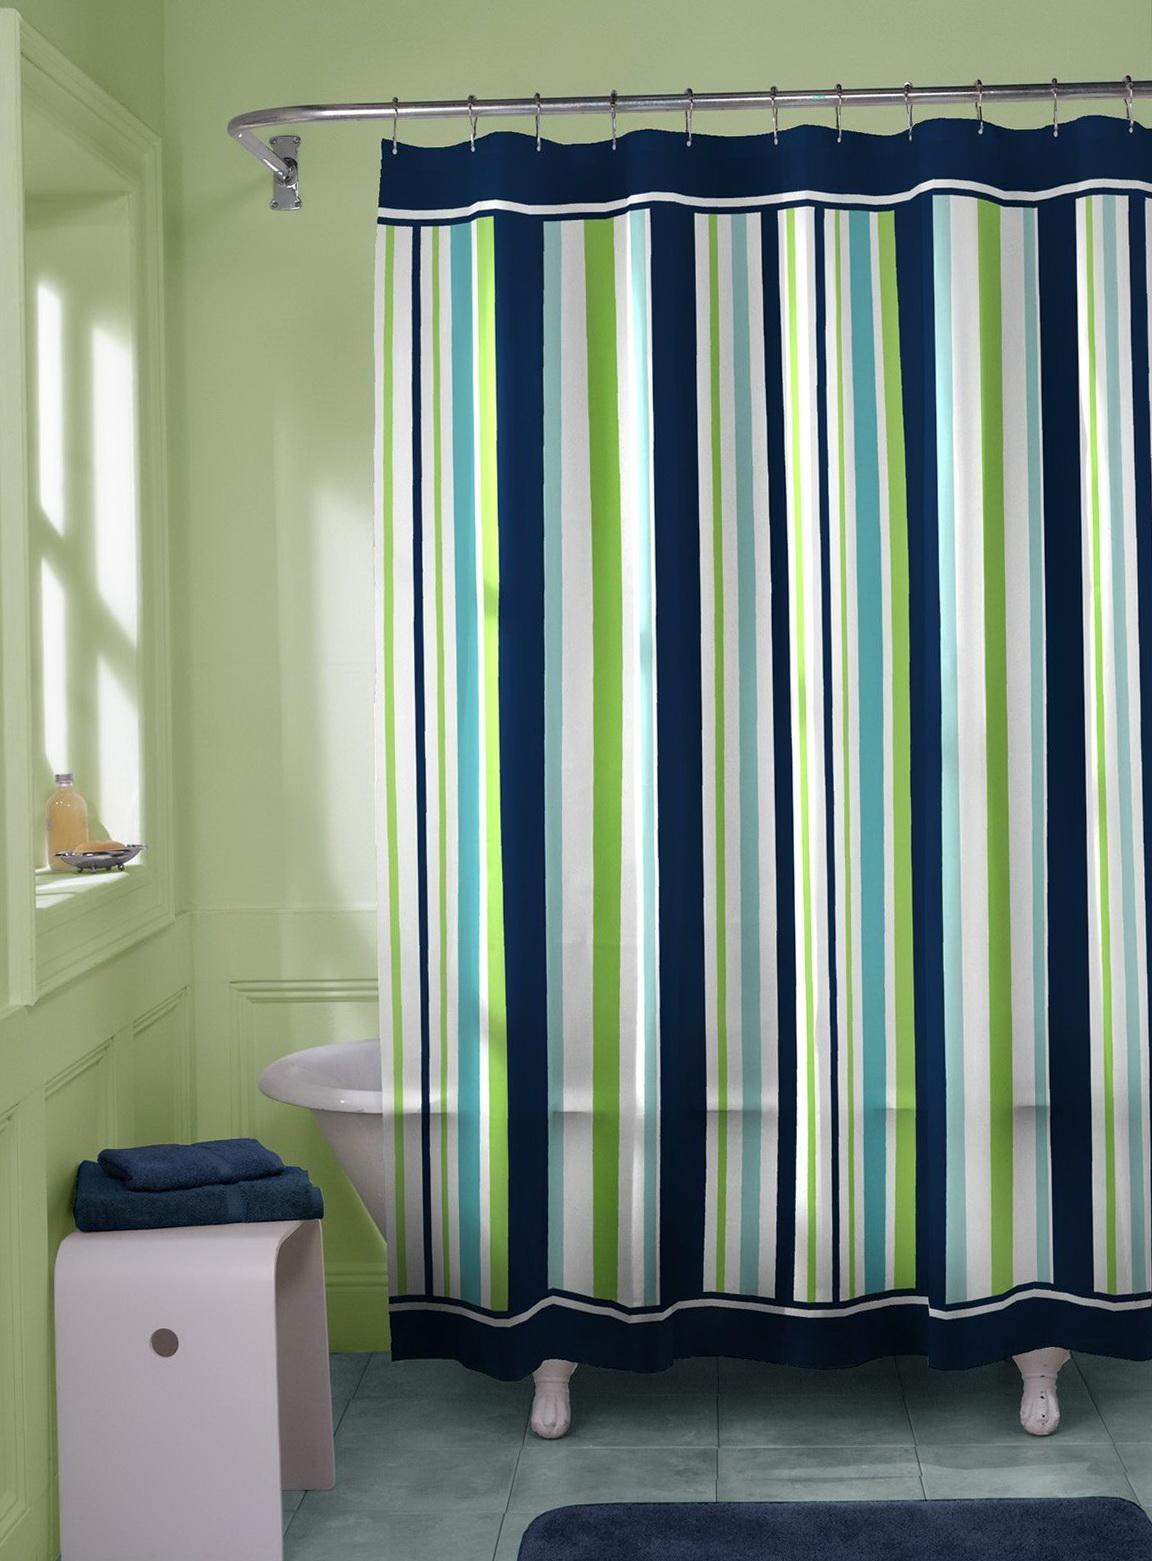 Average length of shower curtain